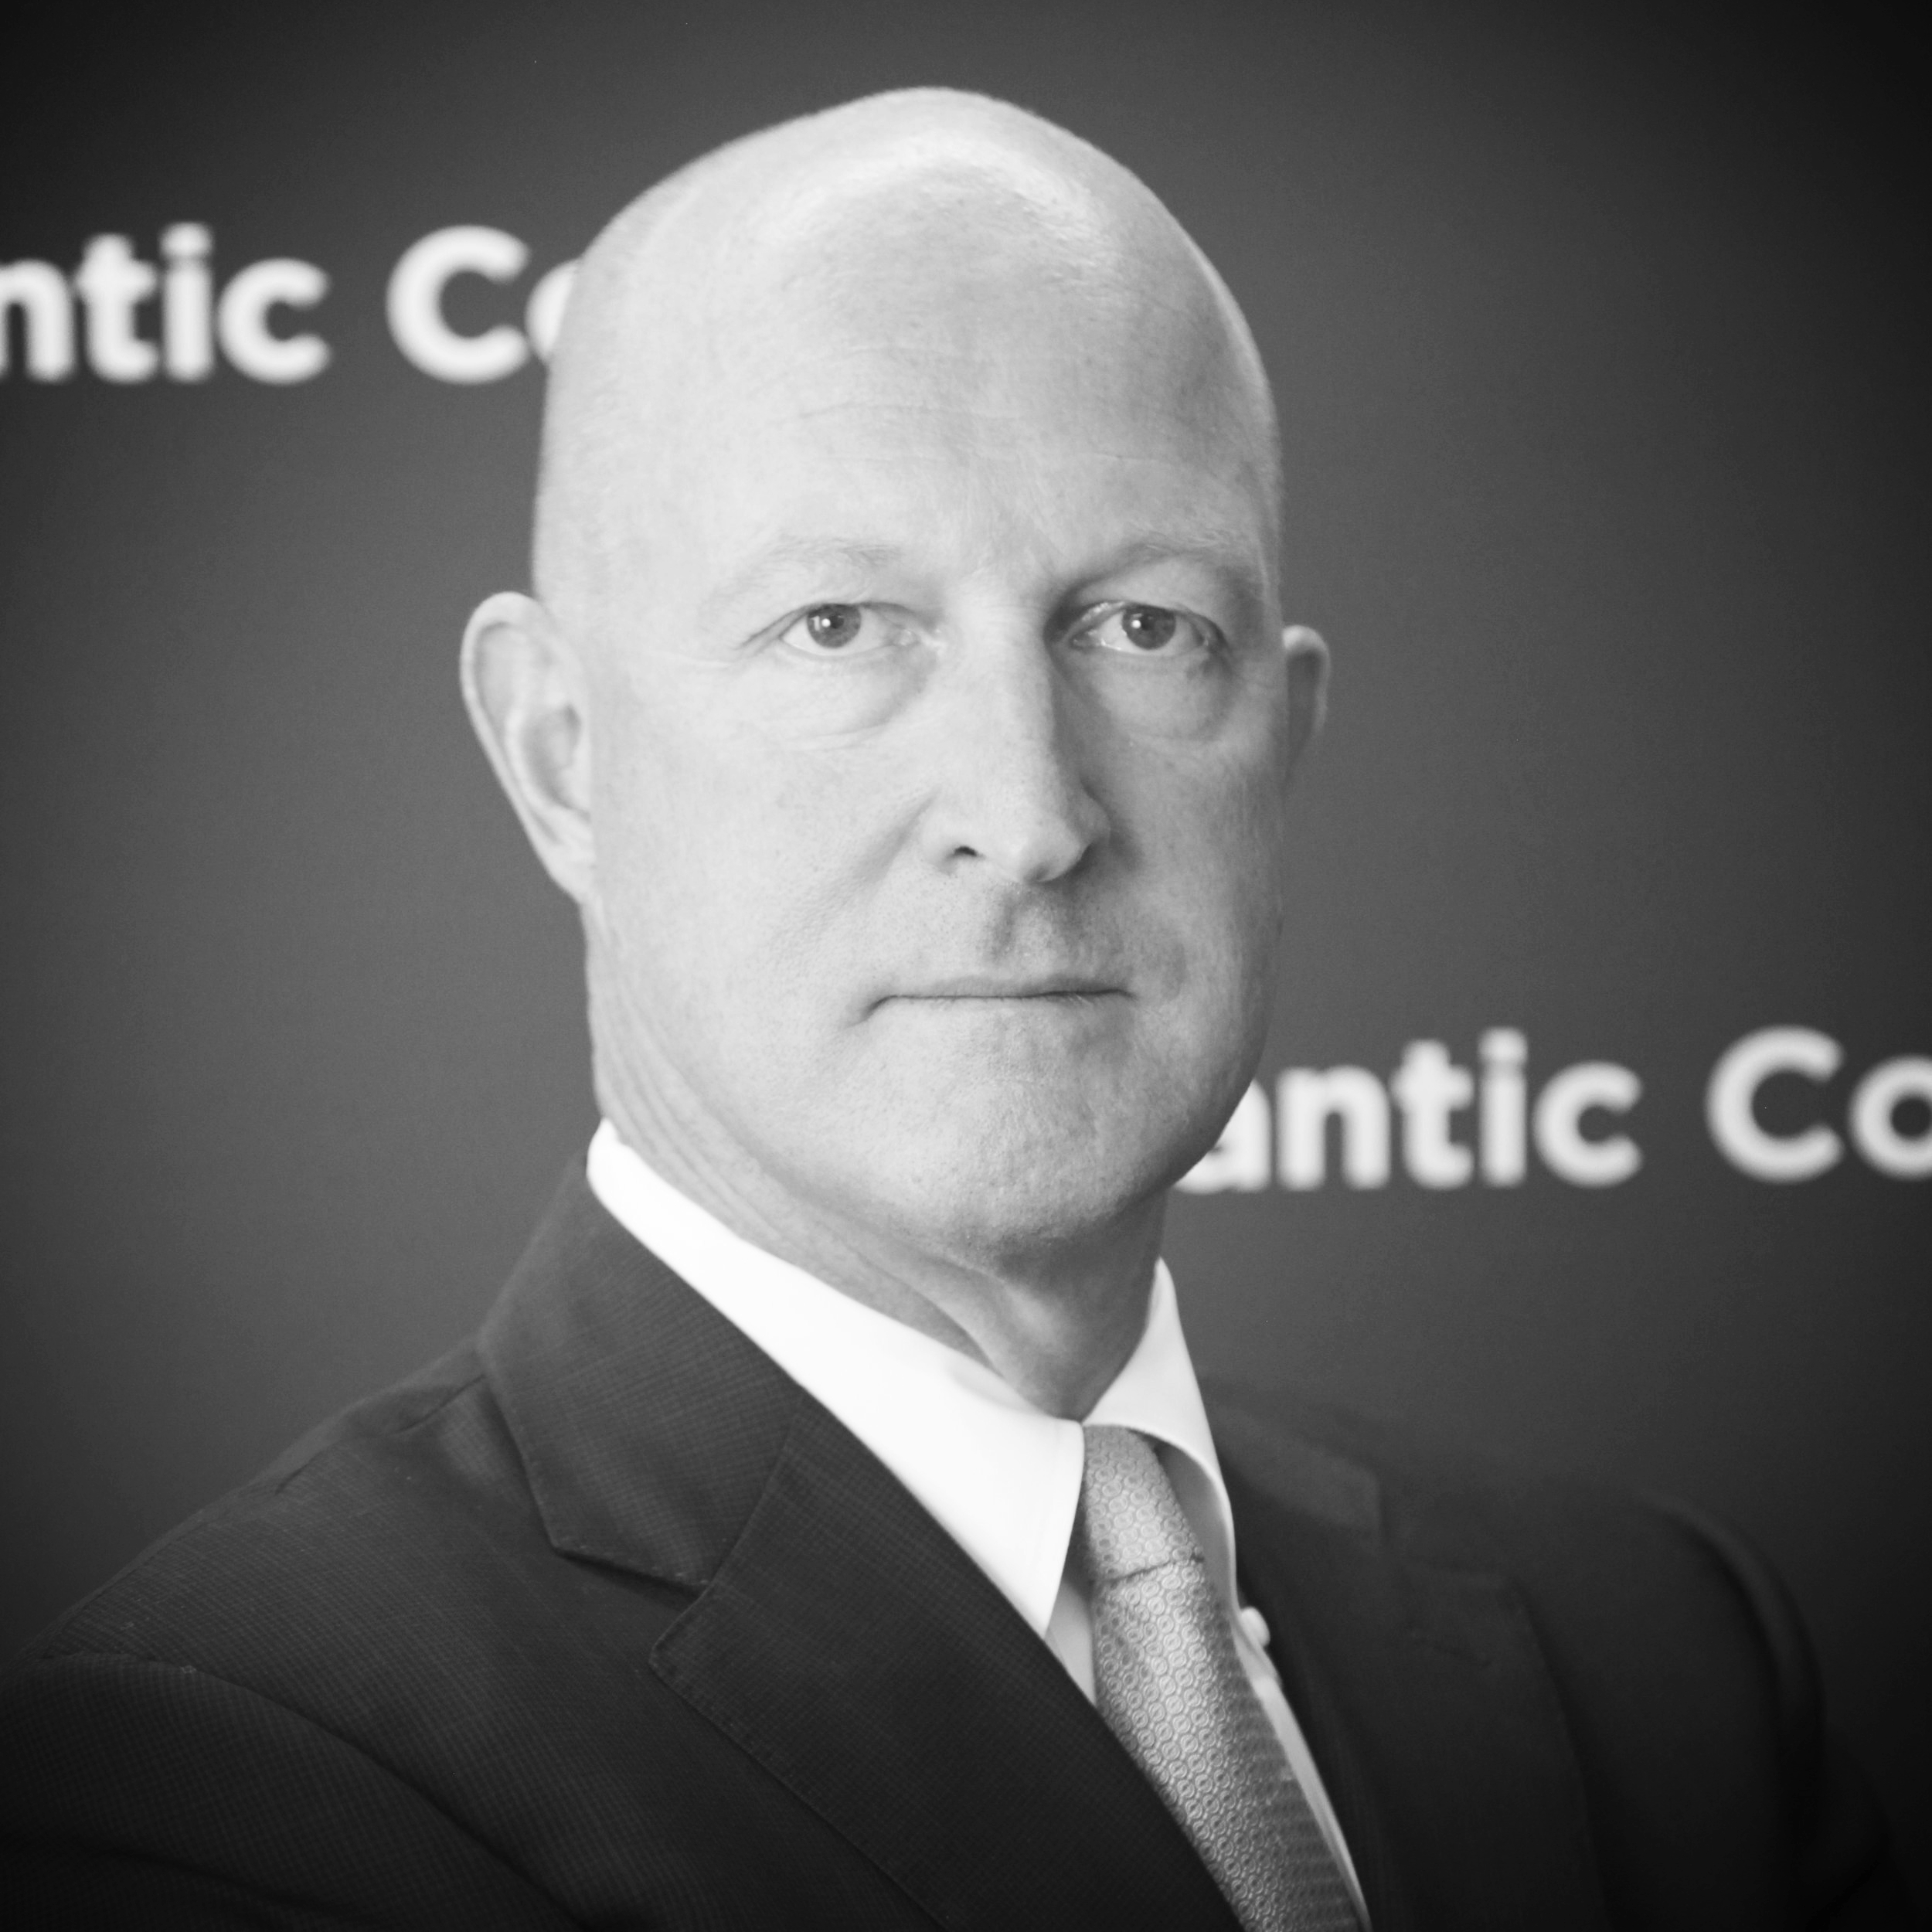 Ian Brzezinski   The Atlantic Council